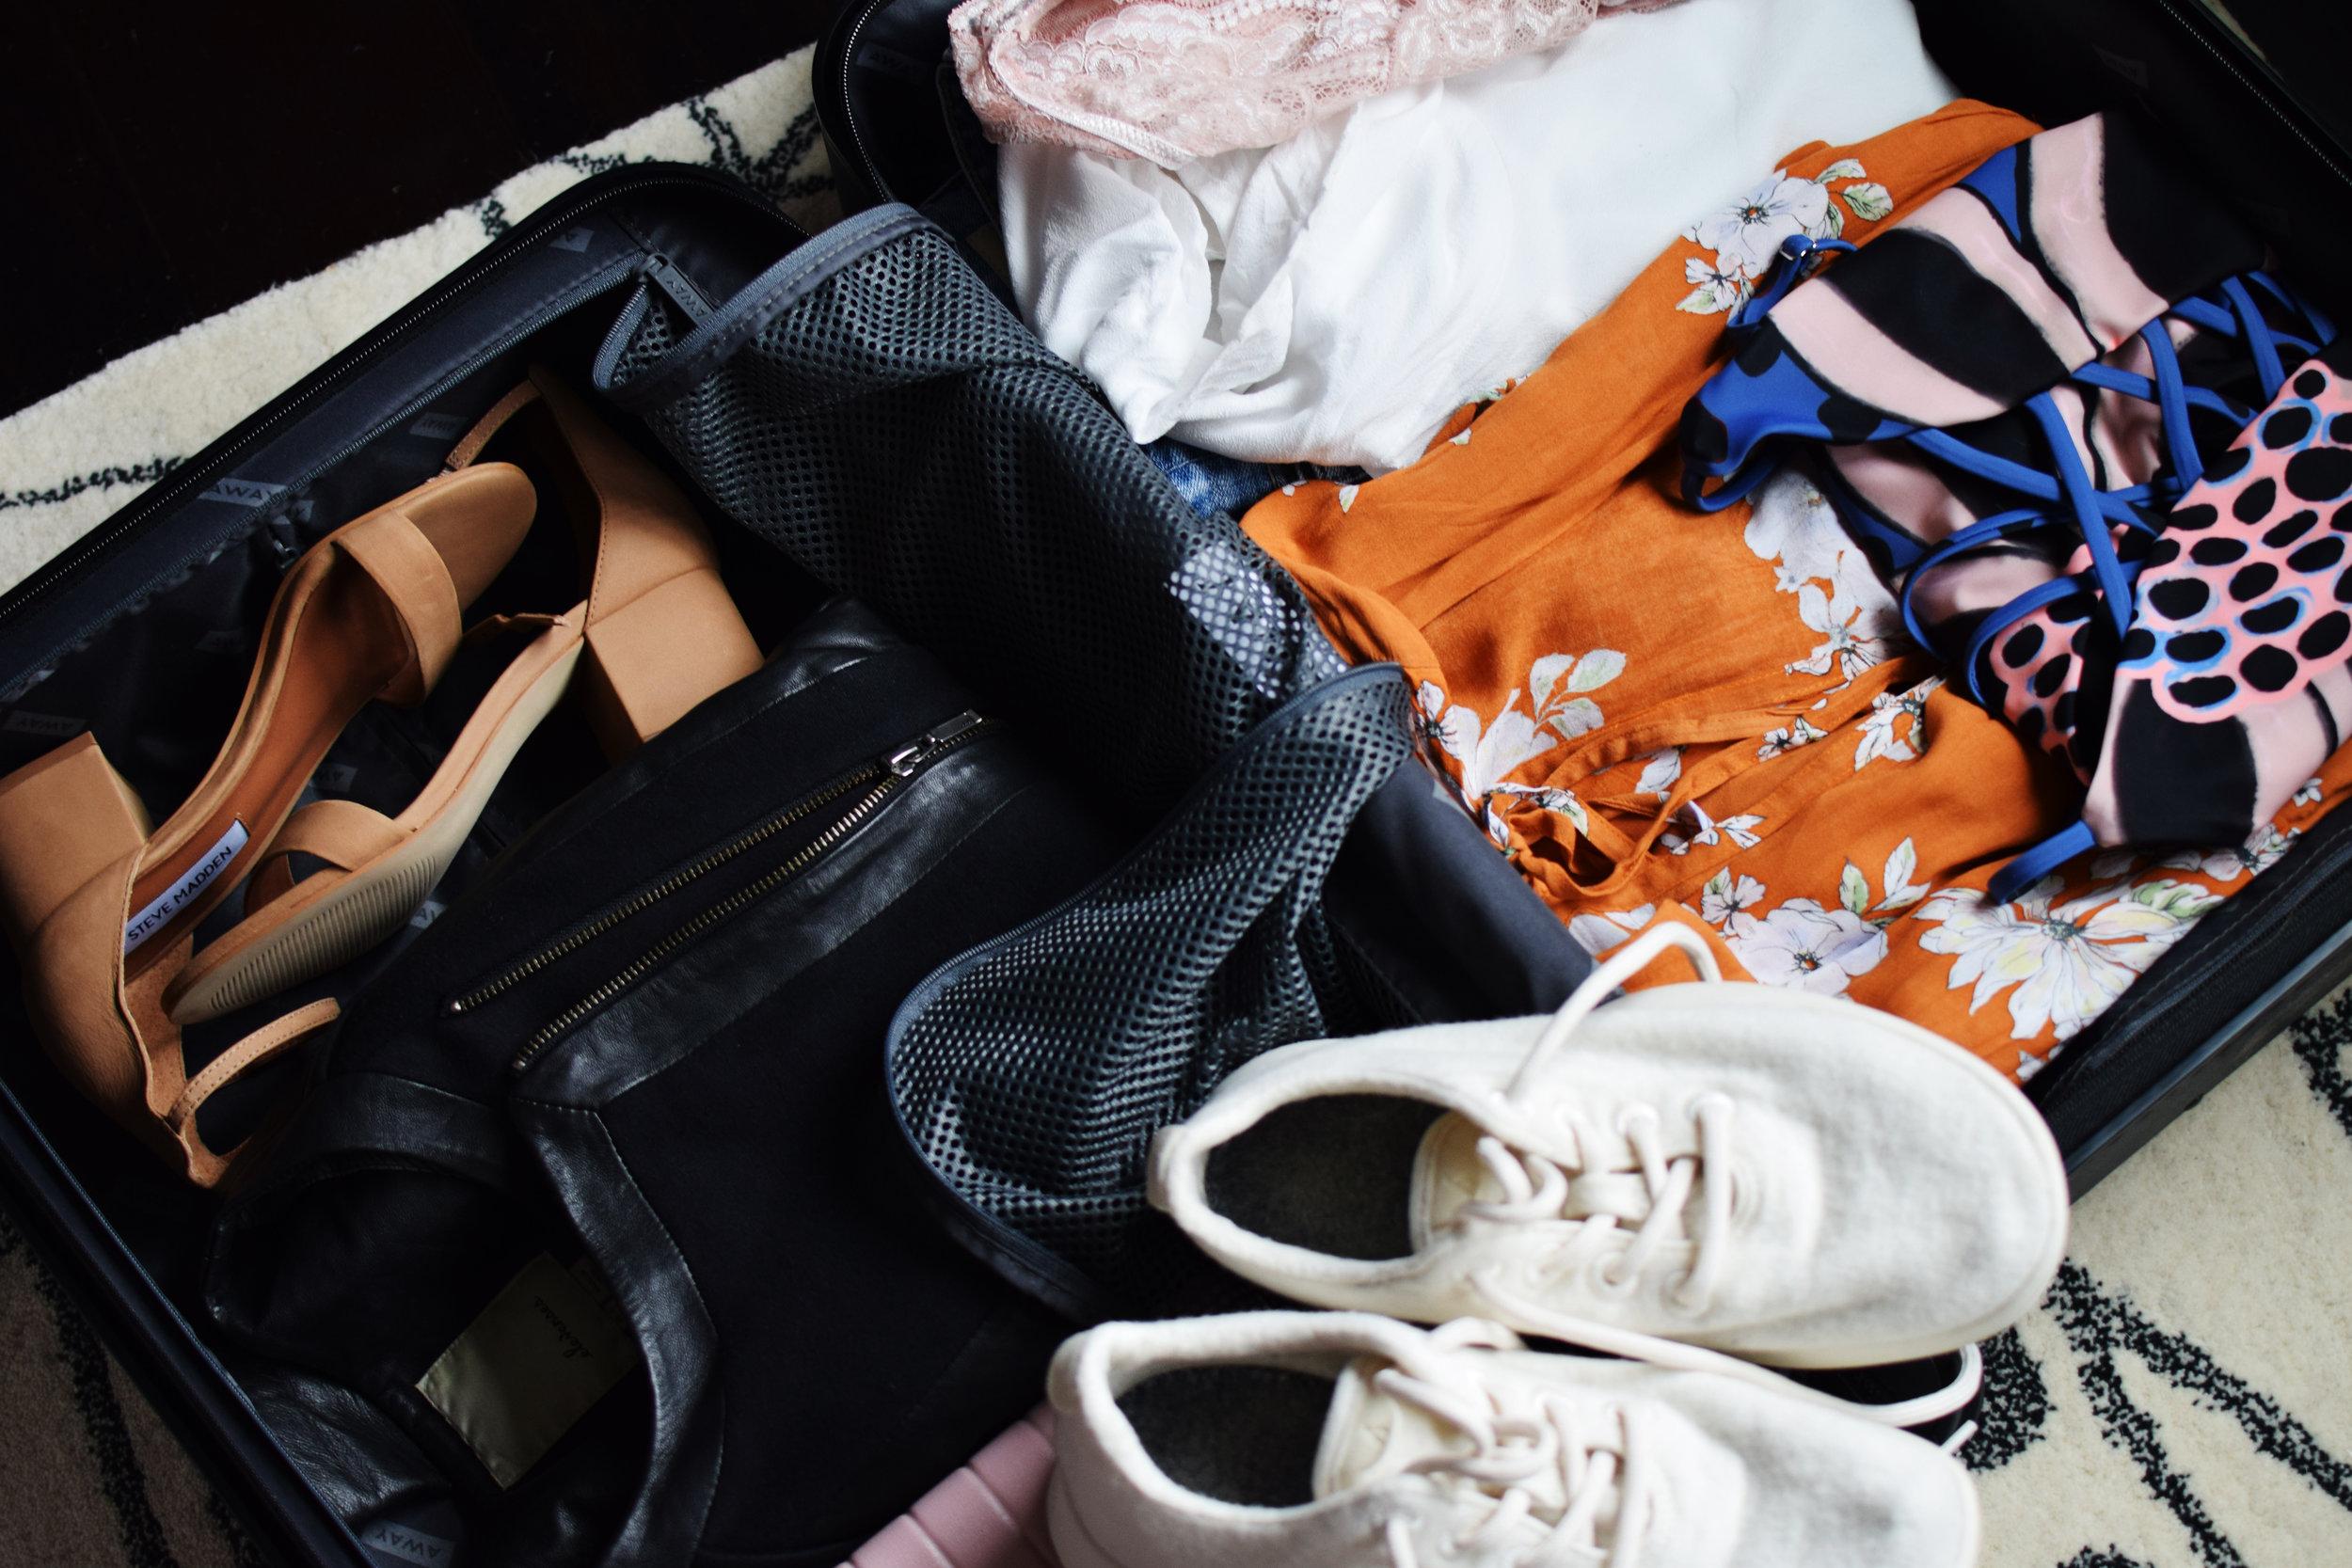 suitcase edit 6.jpg